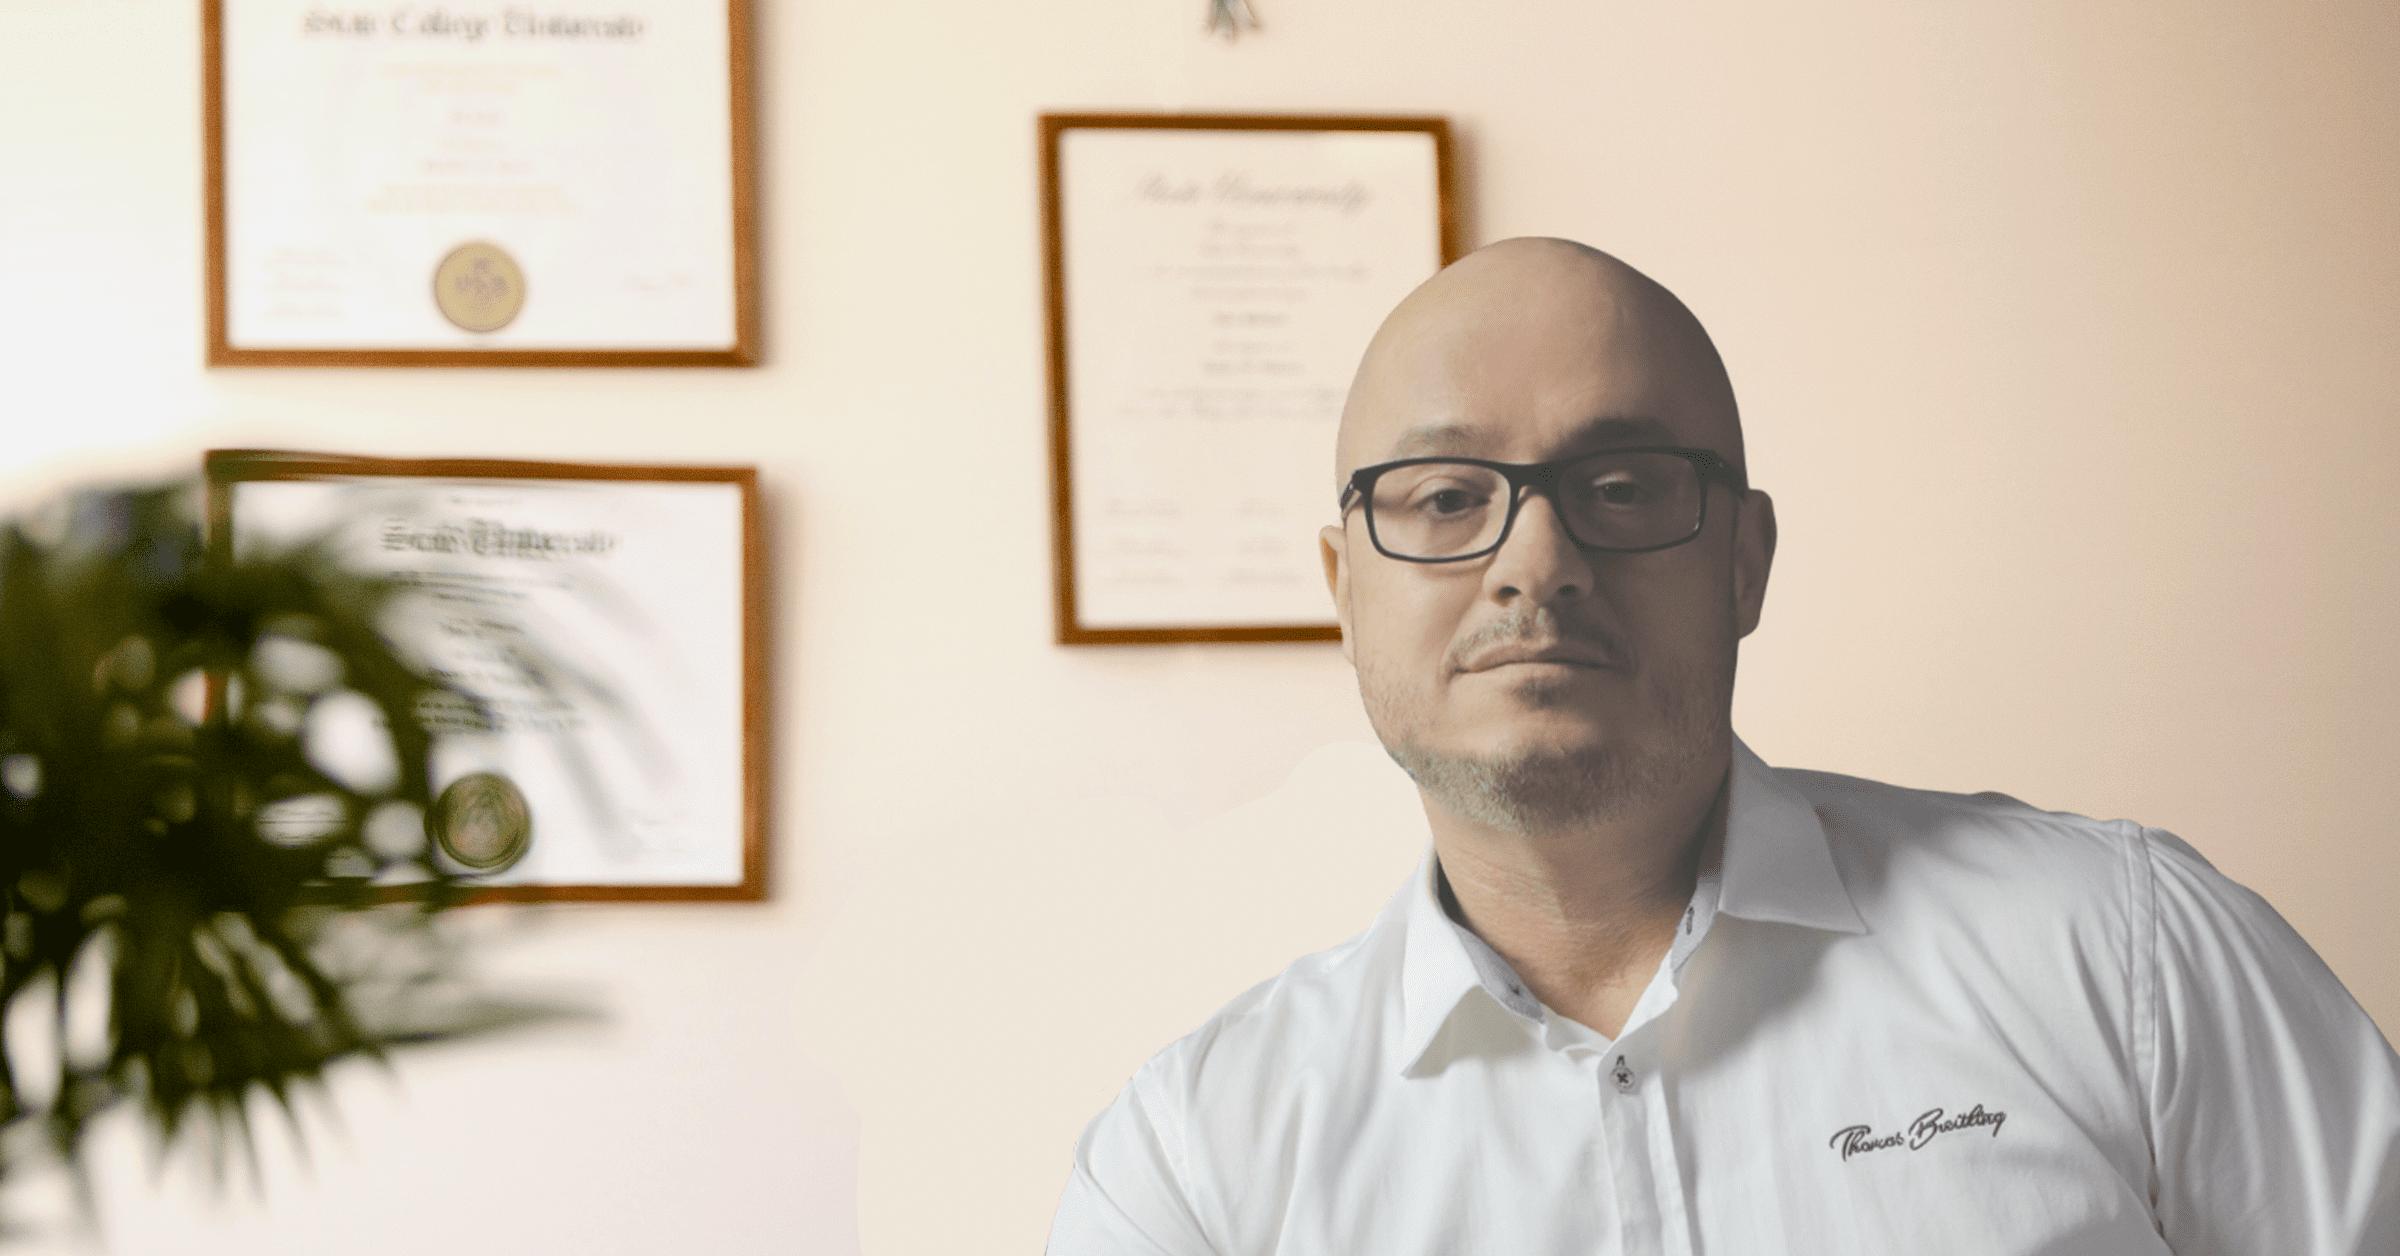 Bakó Krisztián. Online marketing specialista